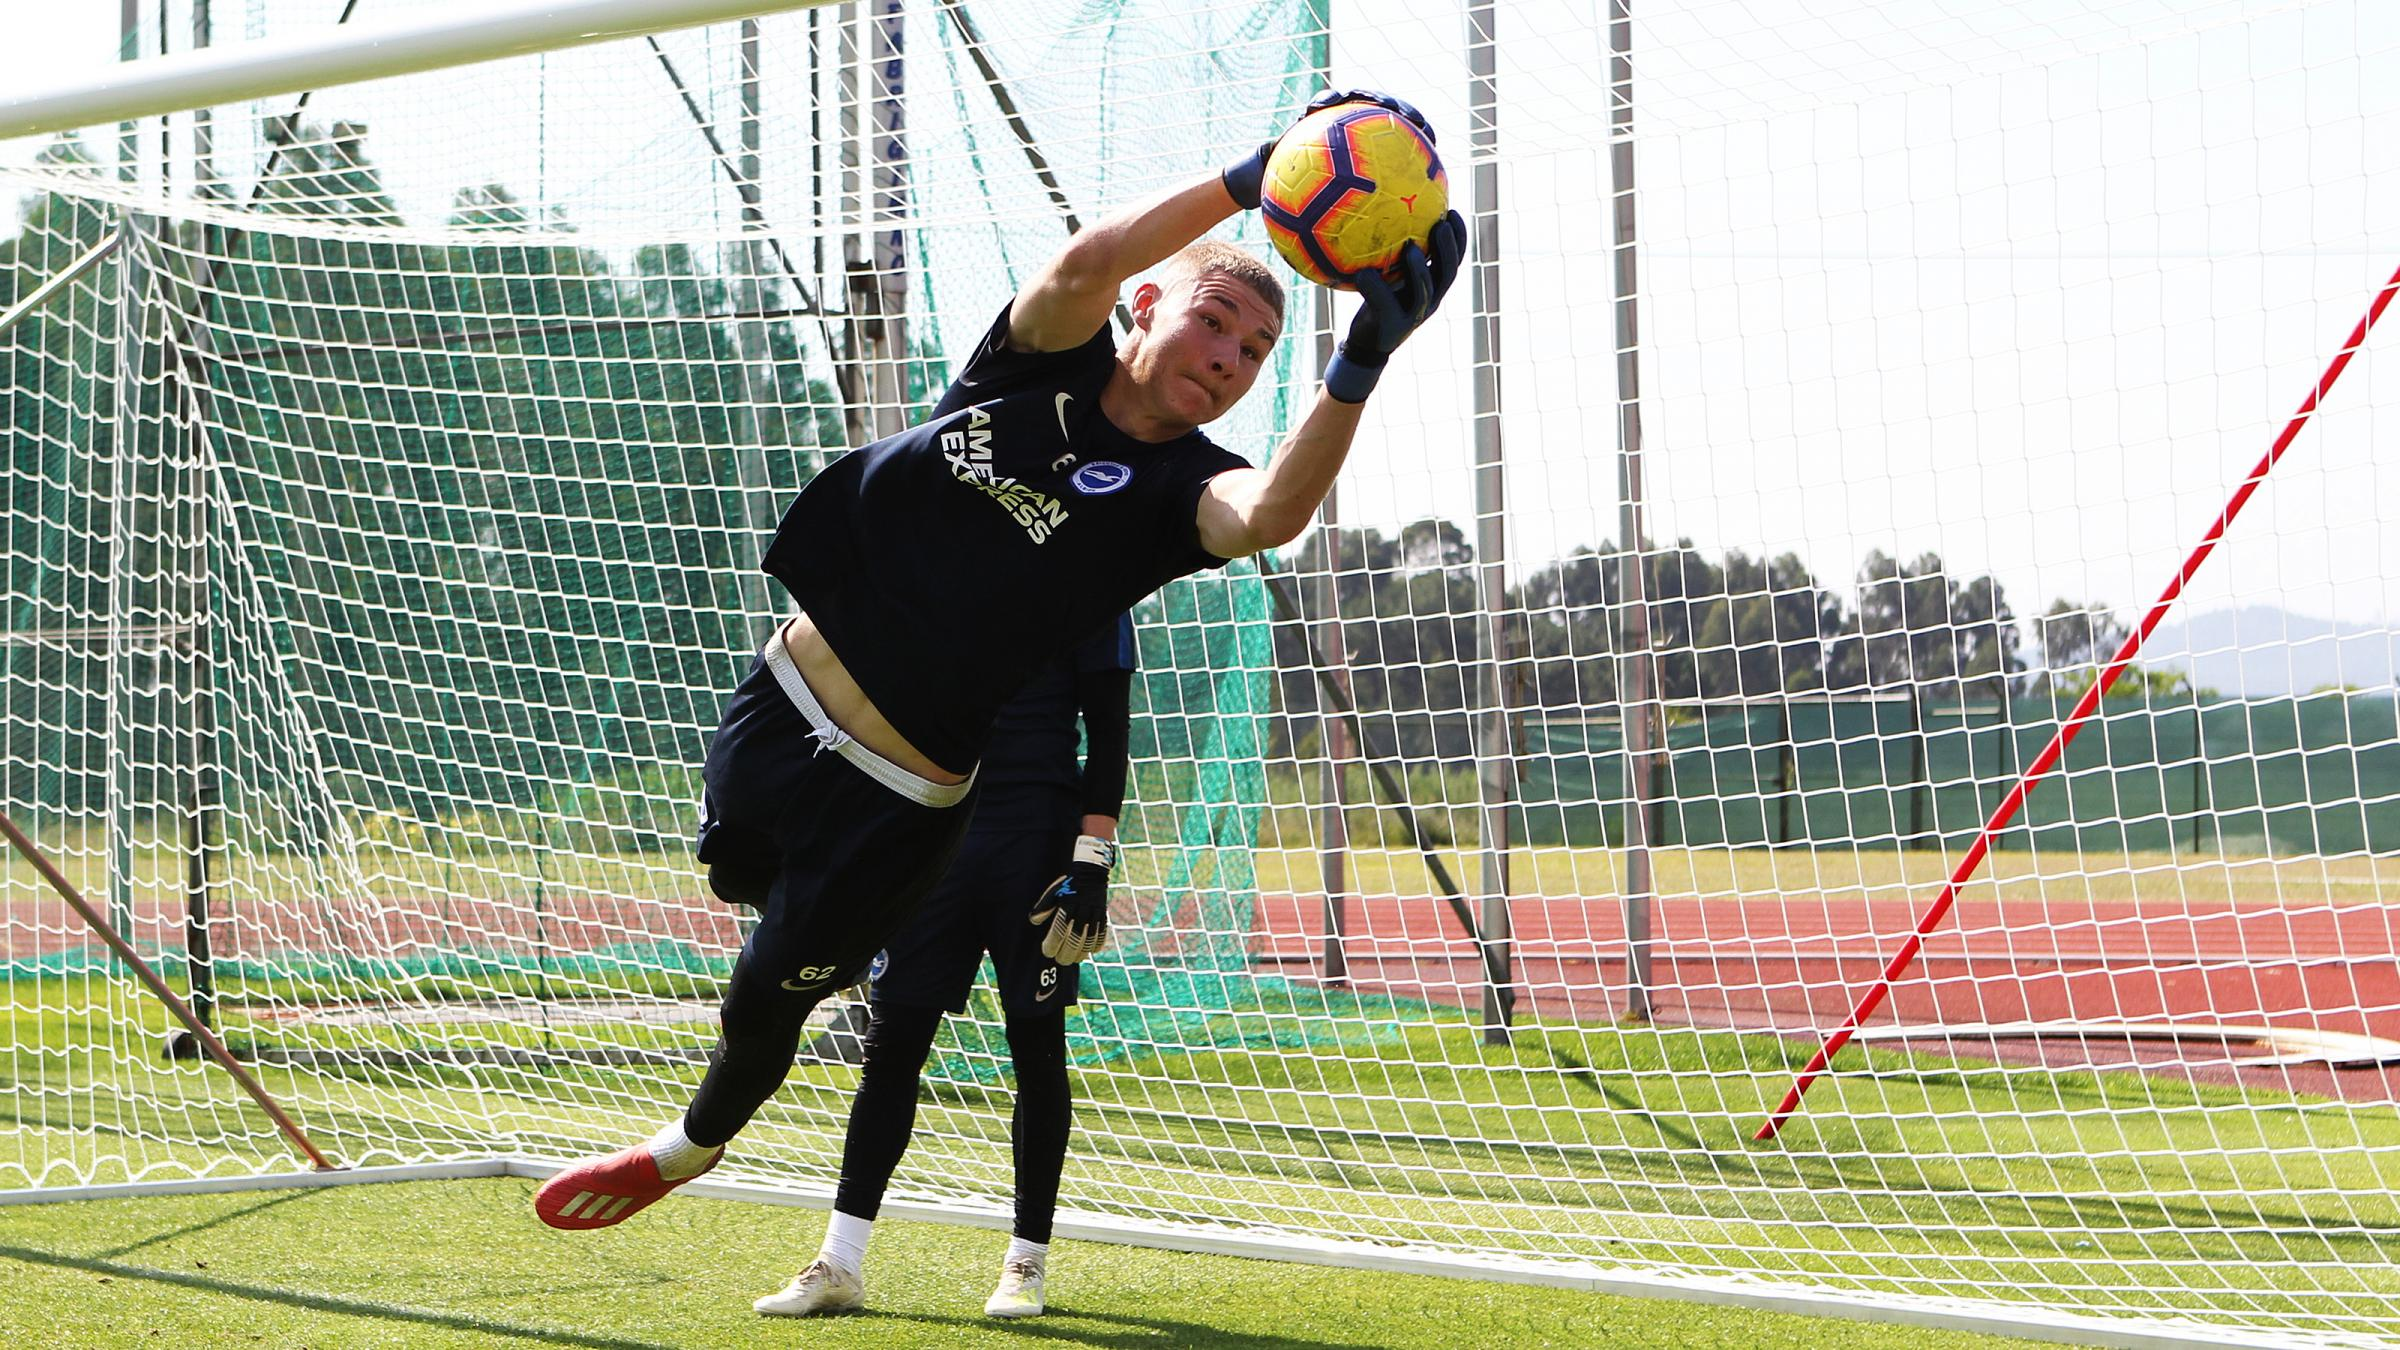 England call for keeper Carl Rushworth